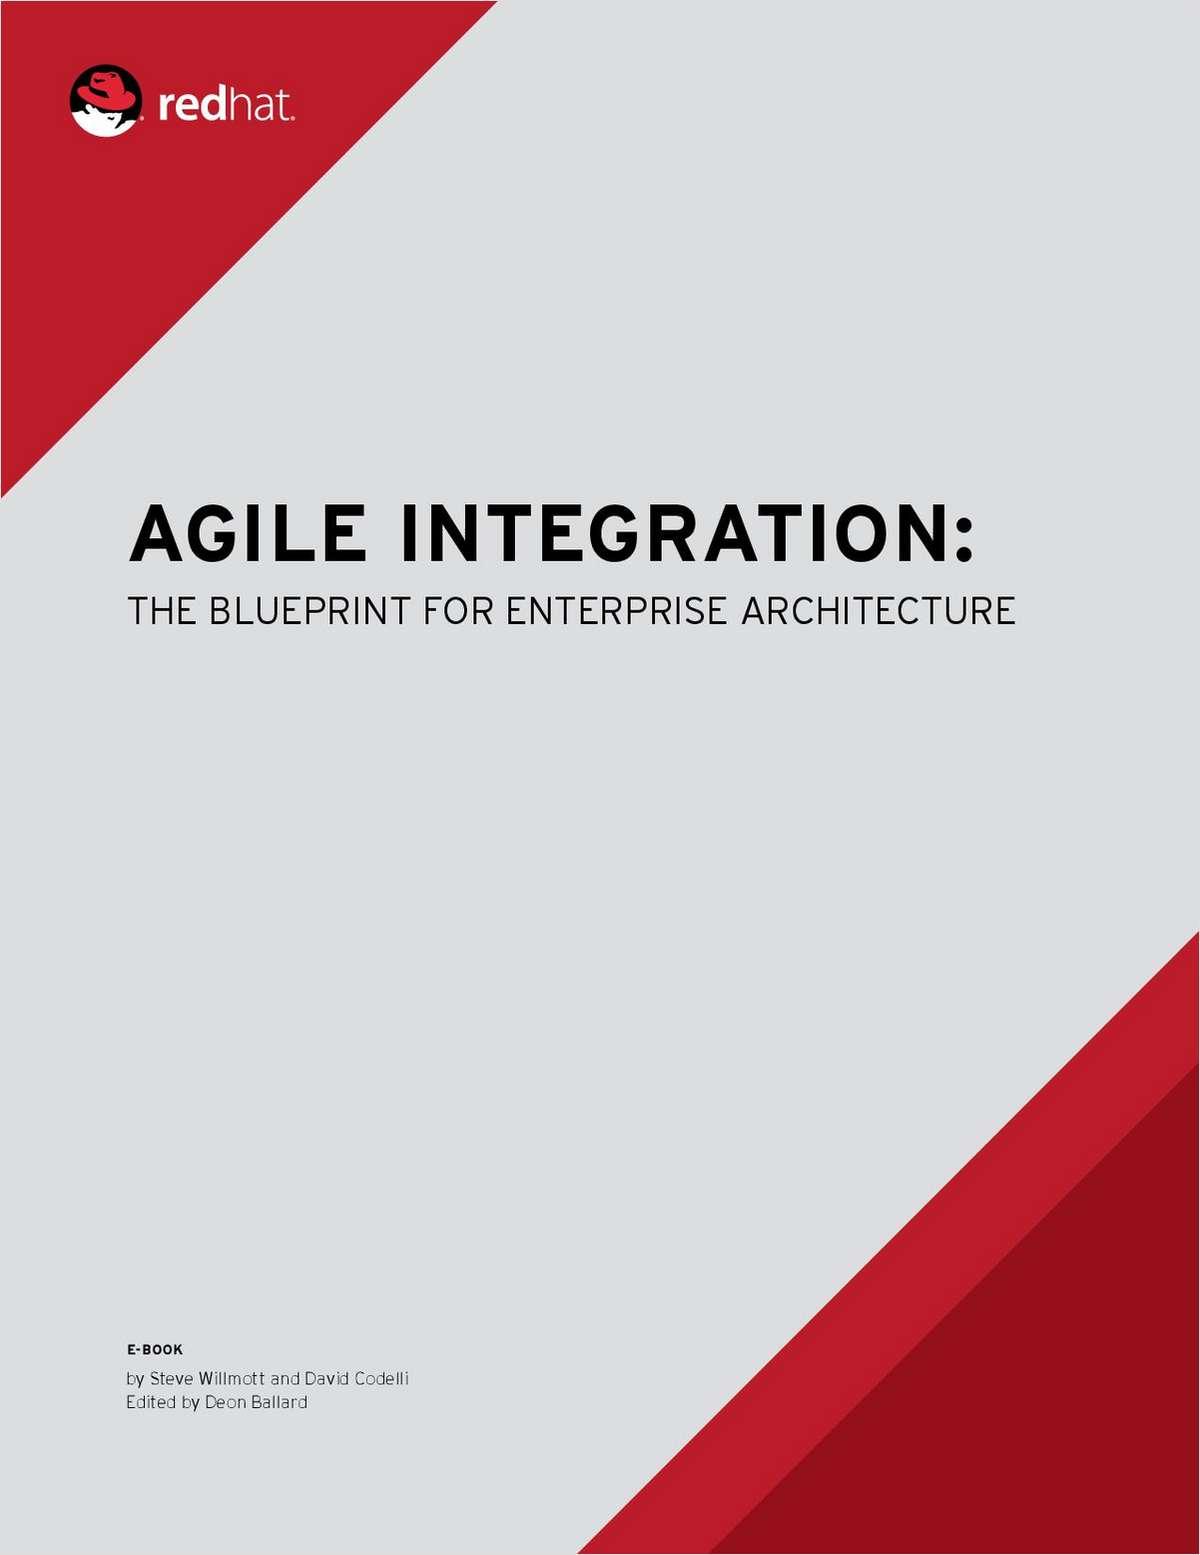 Agile Integration for Enterprise Architecture